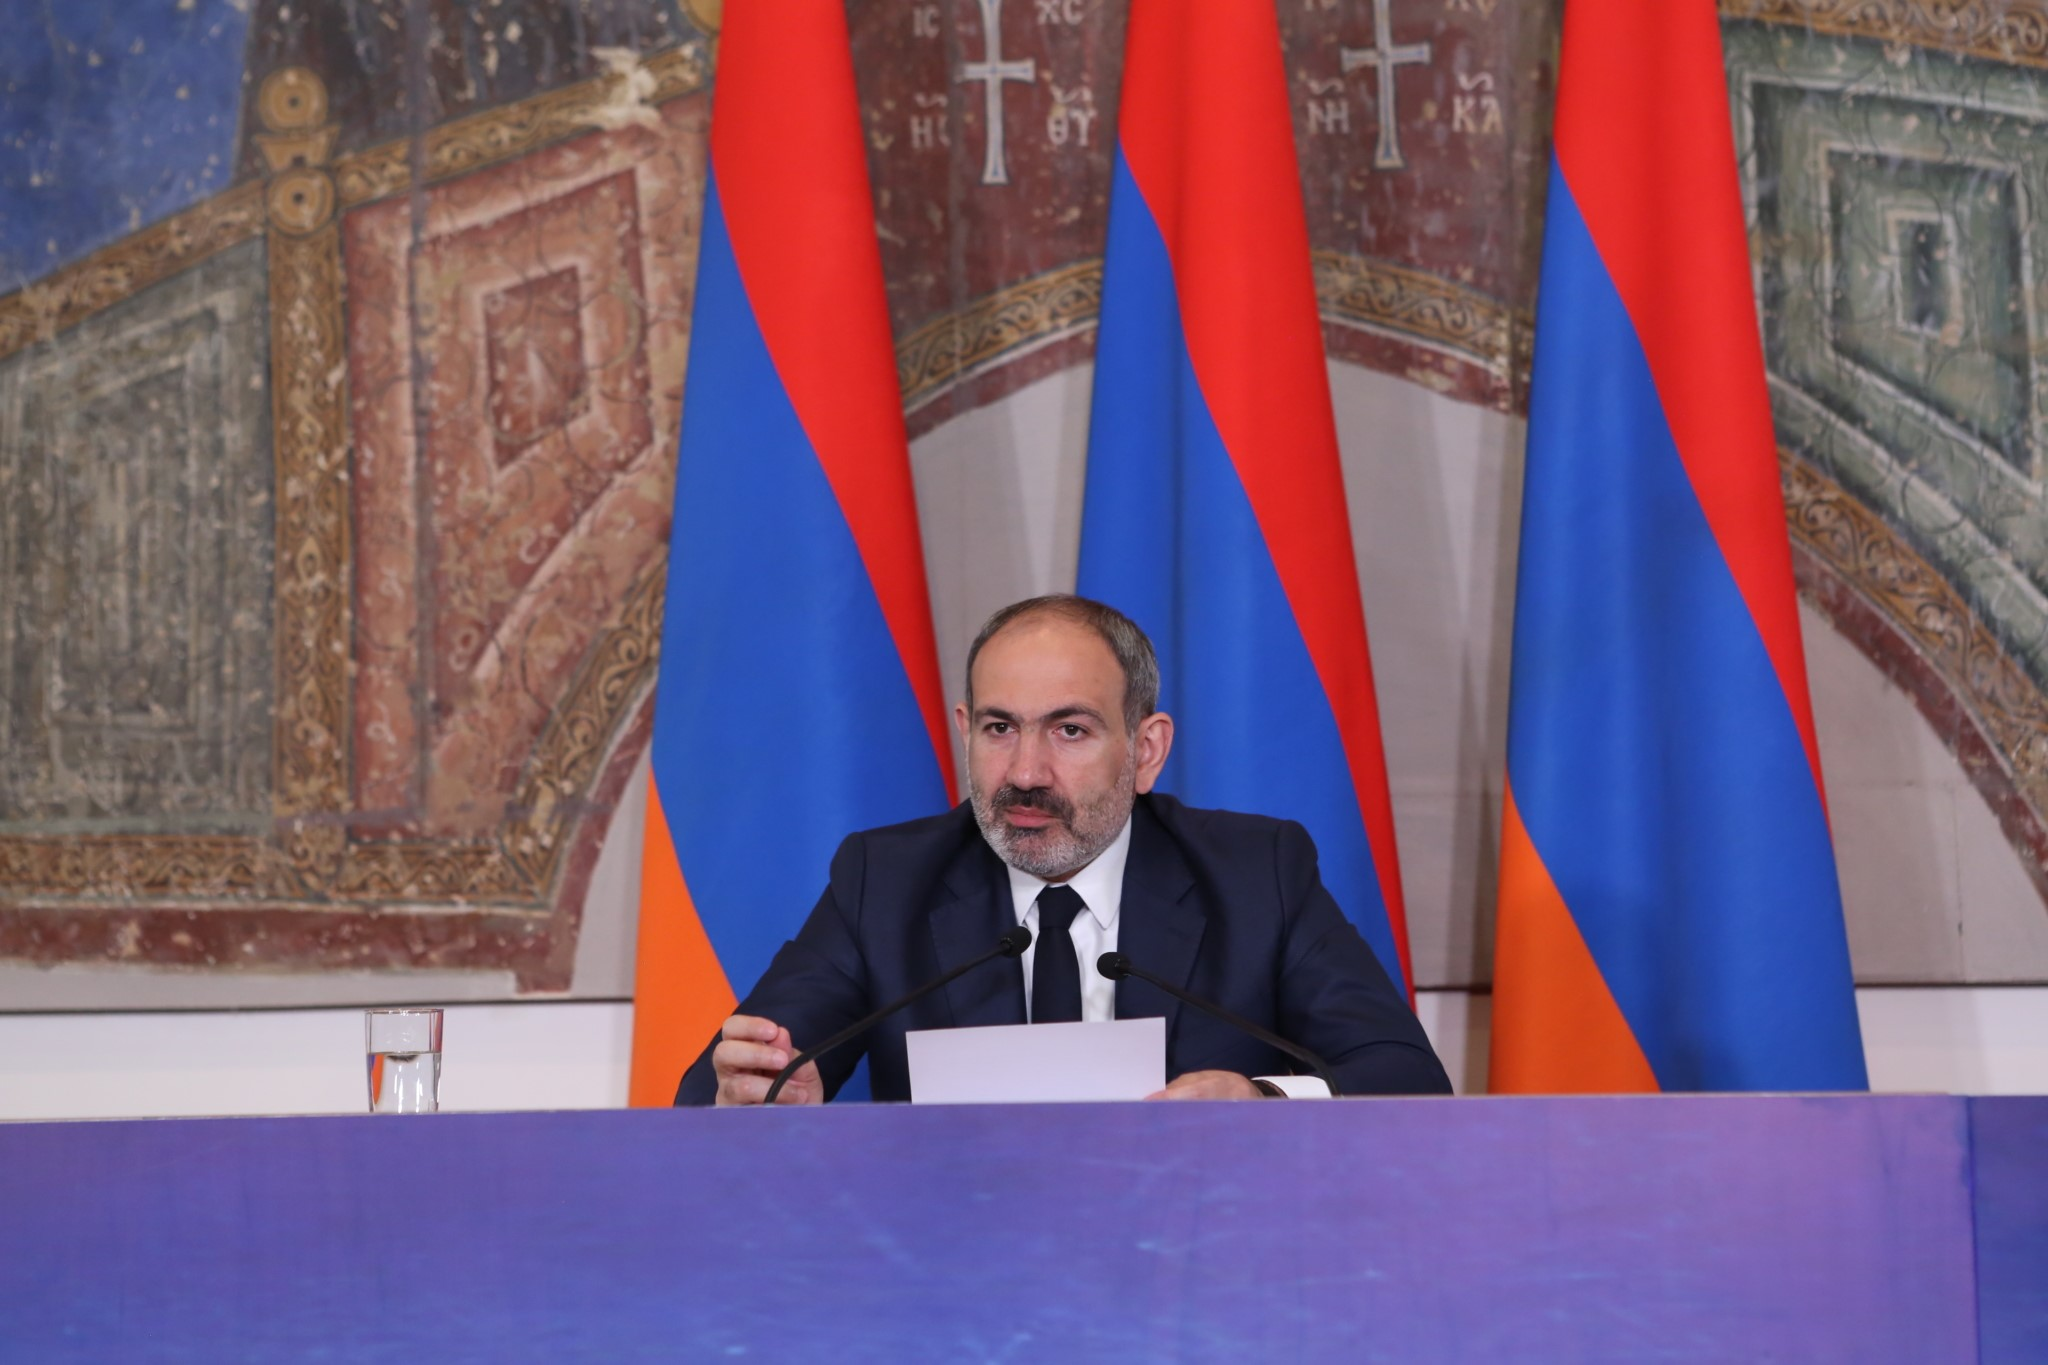 Nikol Pashinyan, Artur Vanetsyan, Nagorno-Karabakh, NSS Armenia